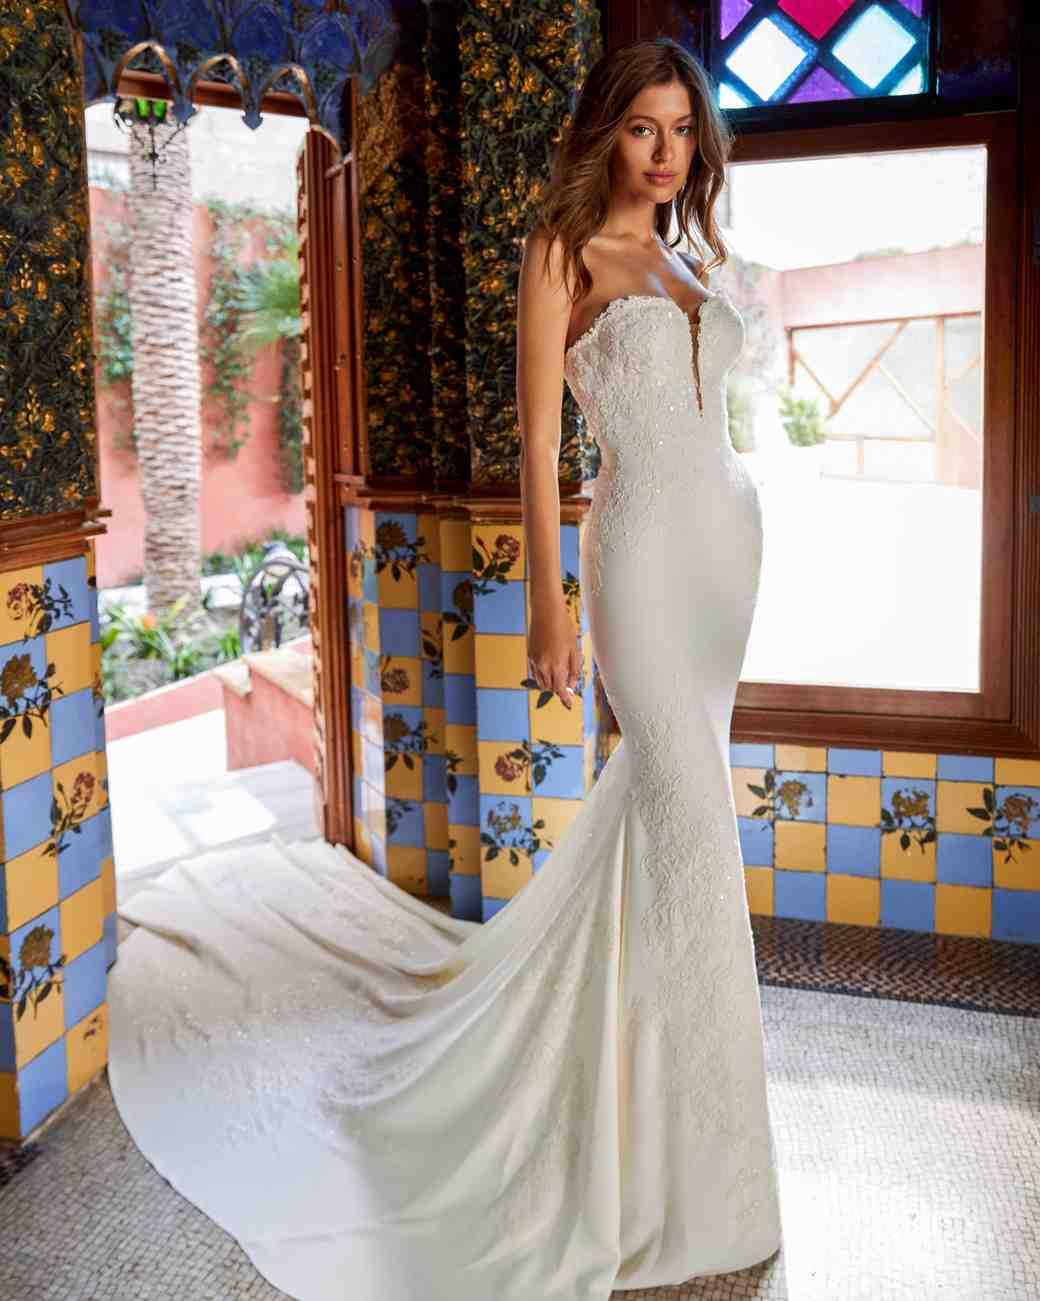 pronovias kleinfeld wedding dress fall 2019 03